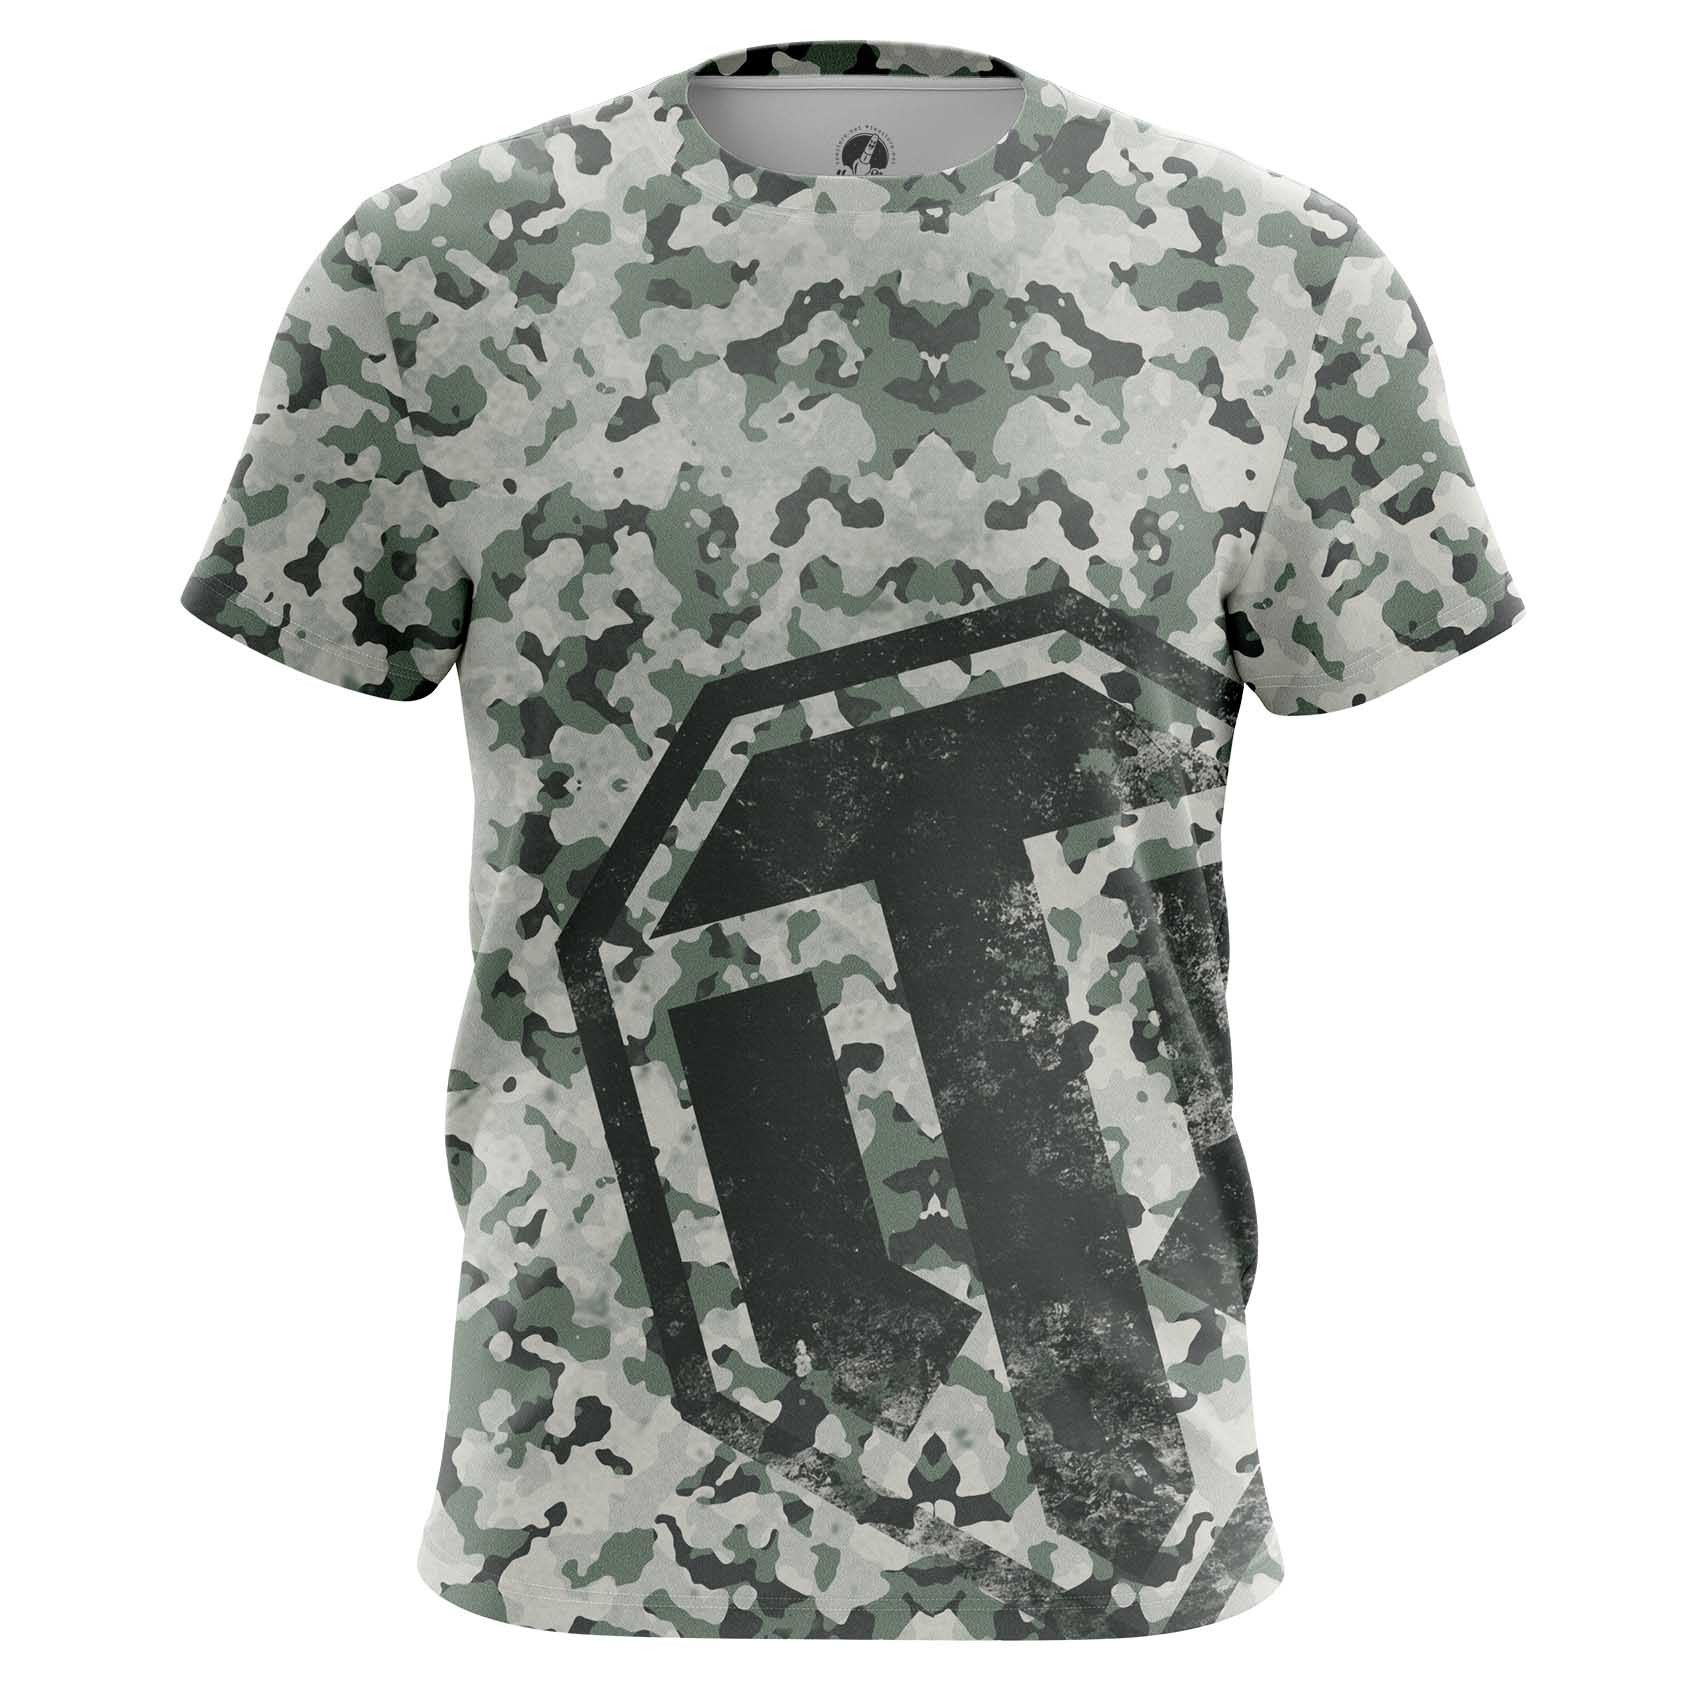 Merch Men'S T-Shirt World Of Tanks Navi Military Pattern